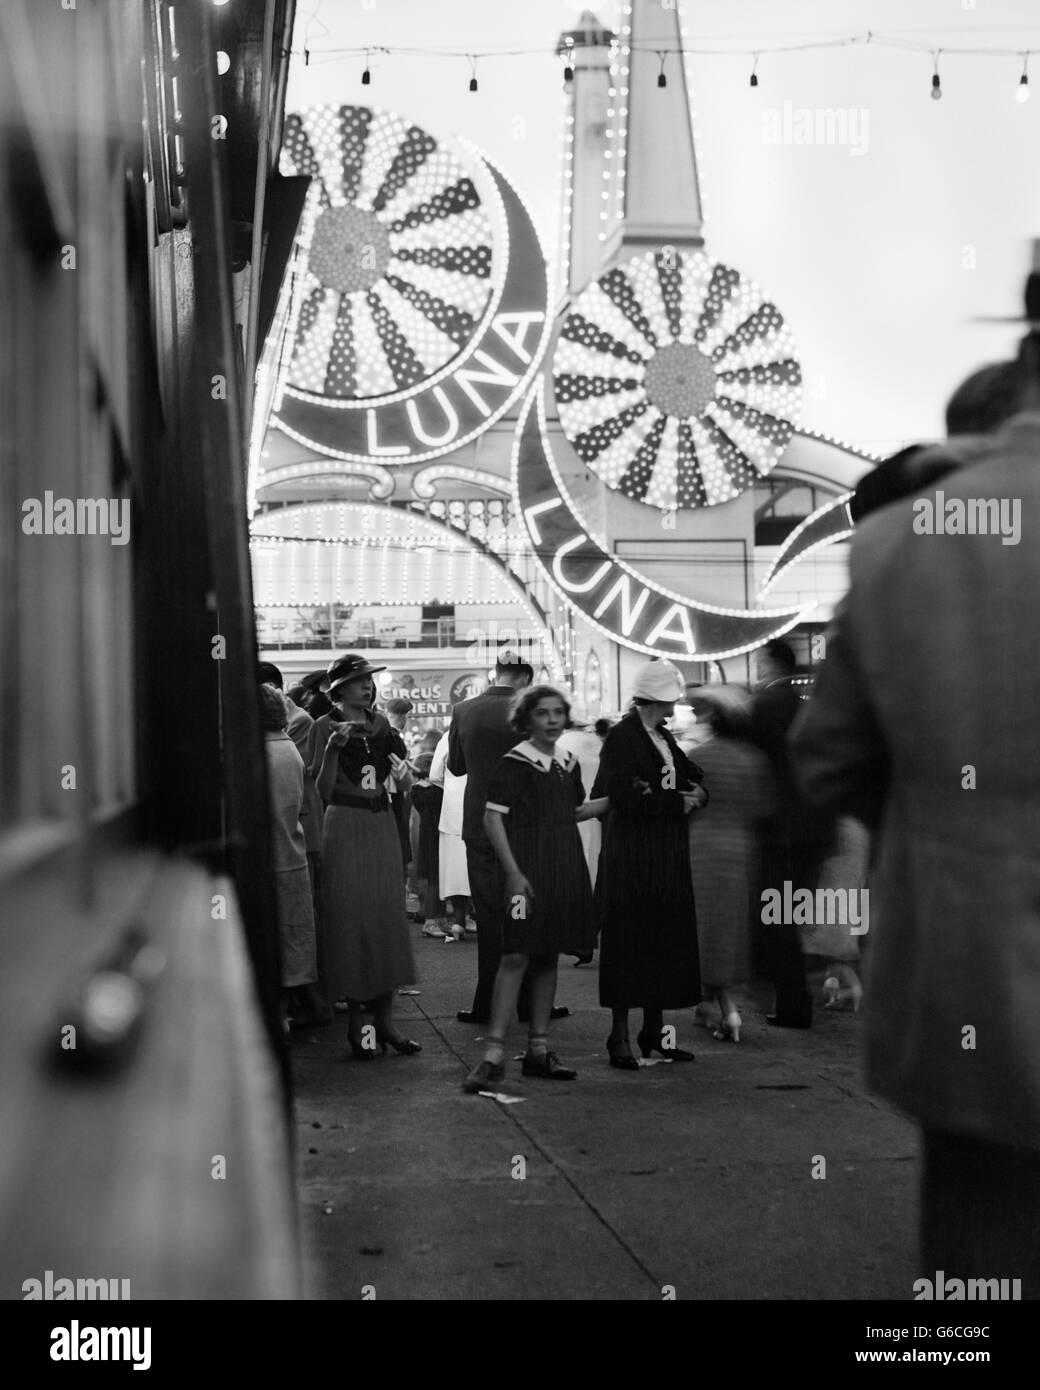 1930 LUNA PARK EN DÉBUT DE SOIRÉE CONEY ISLAND BROOKLYN NEW YORK USA Photo Stock